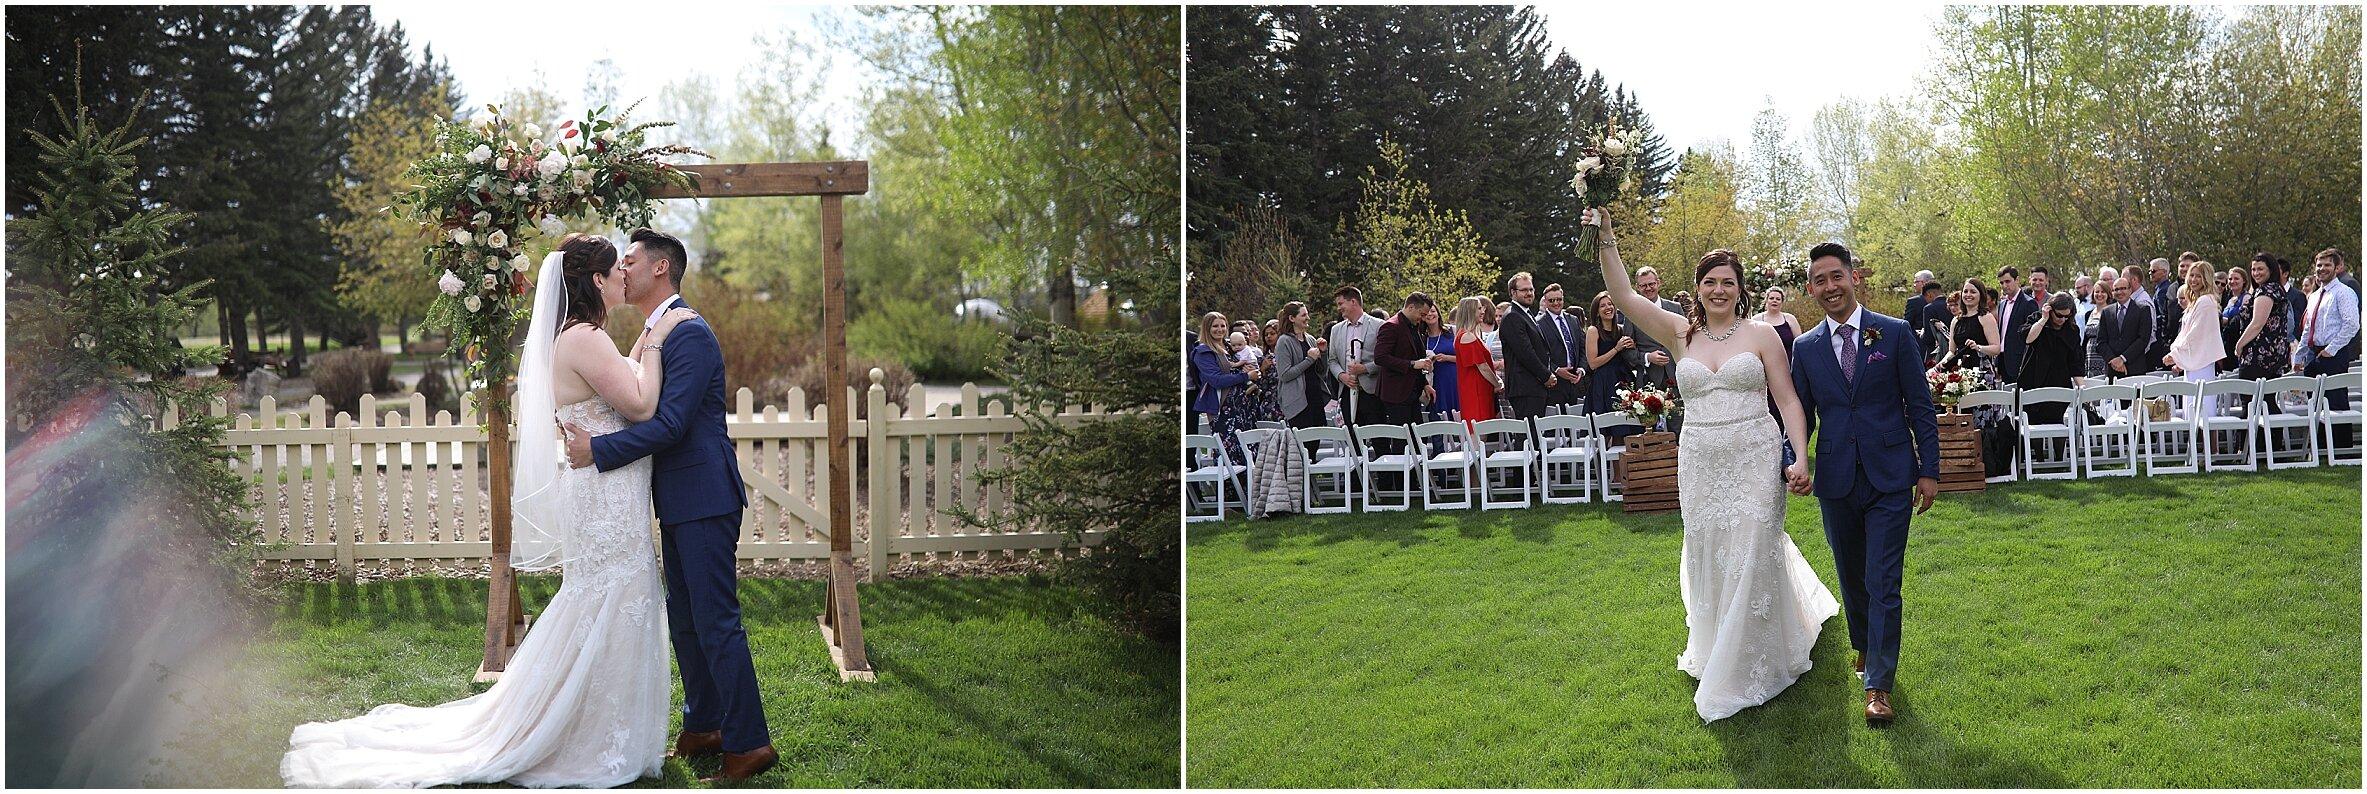 vancouver-wedding-photographer-the-loft-earls-yaletown_0107.jpg